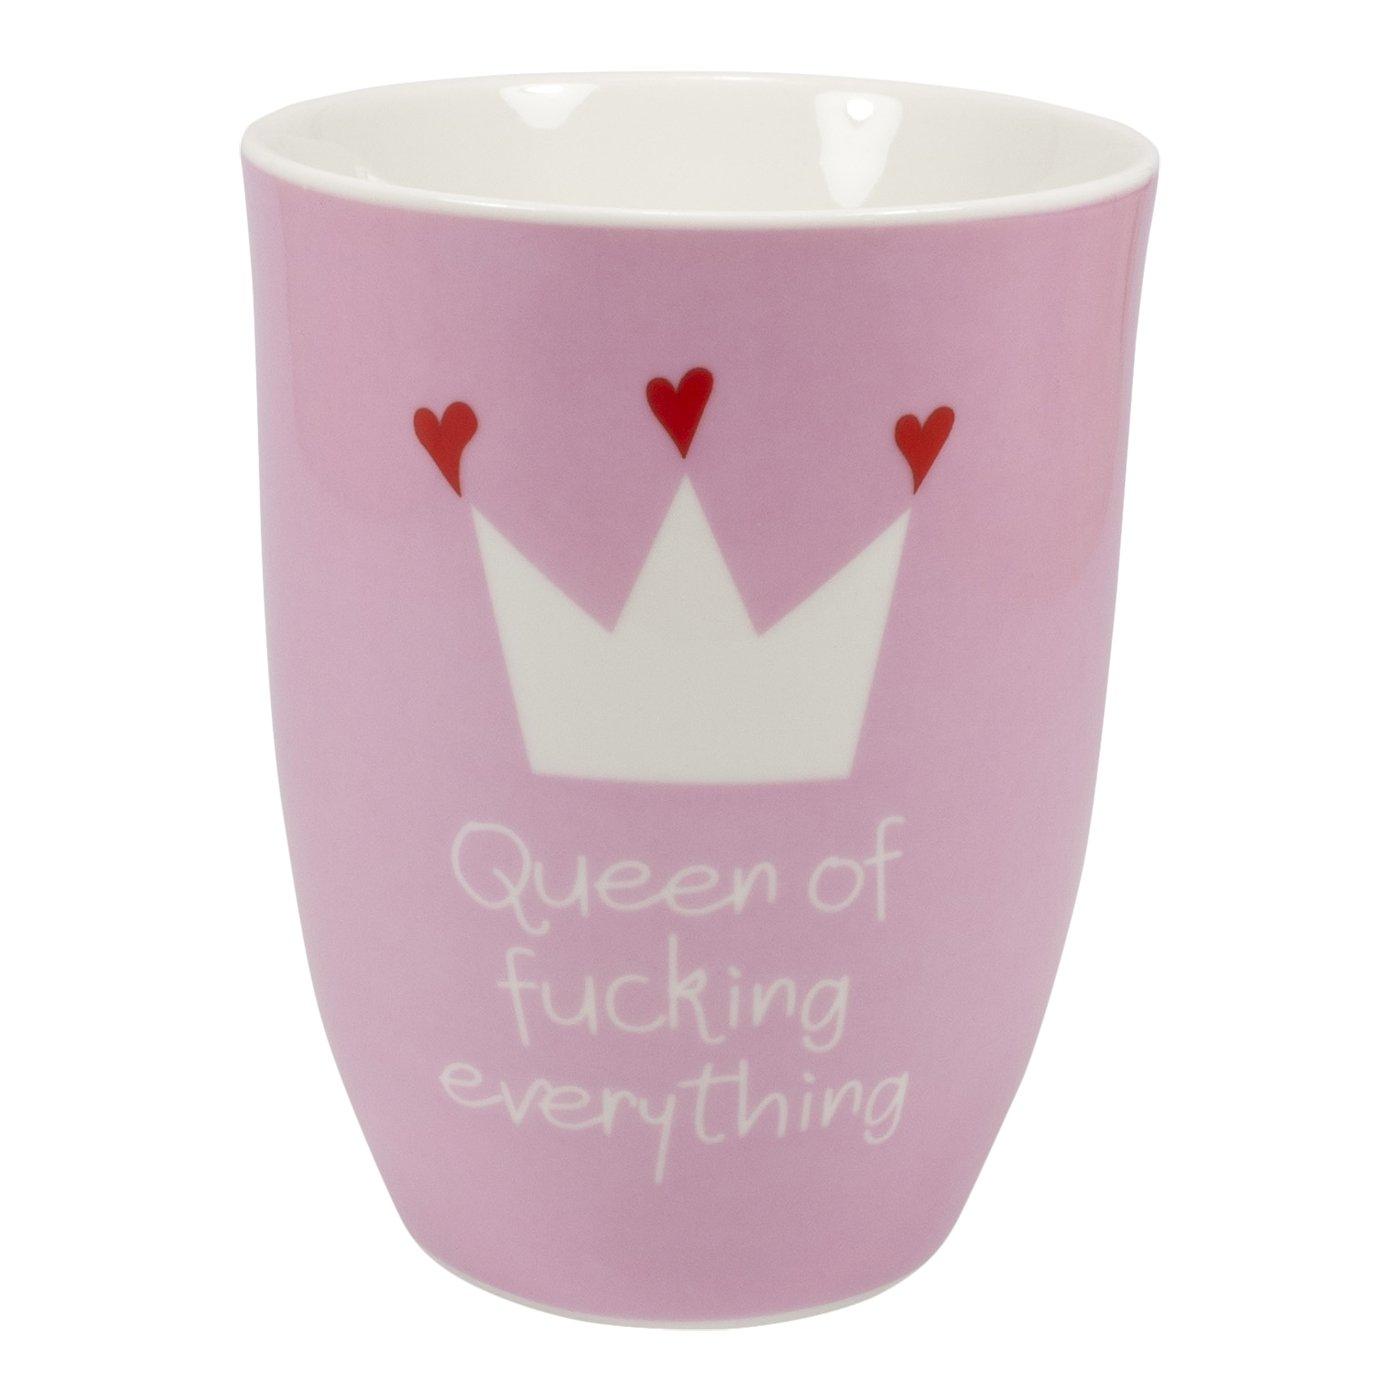 Frühstücksset Queen Queen Queen of fucking everything , 3 Teilig Brettchen Schale und Becher B010VABQAG Kombiservice d564ec